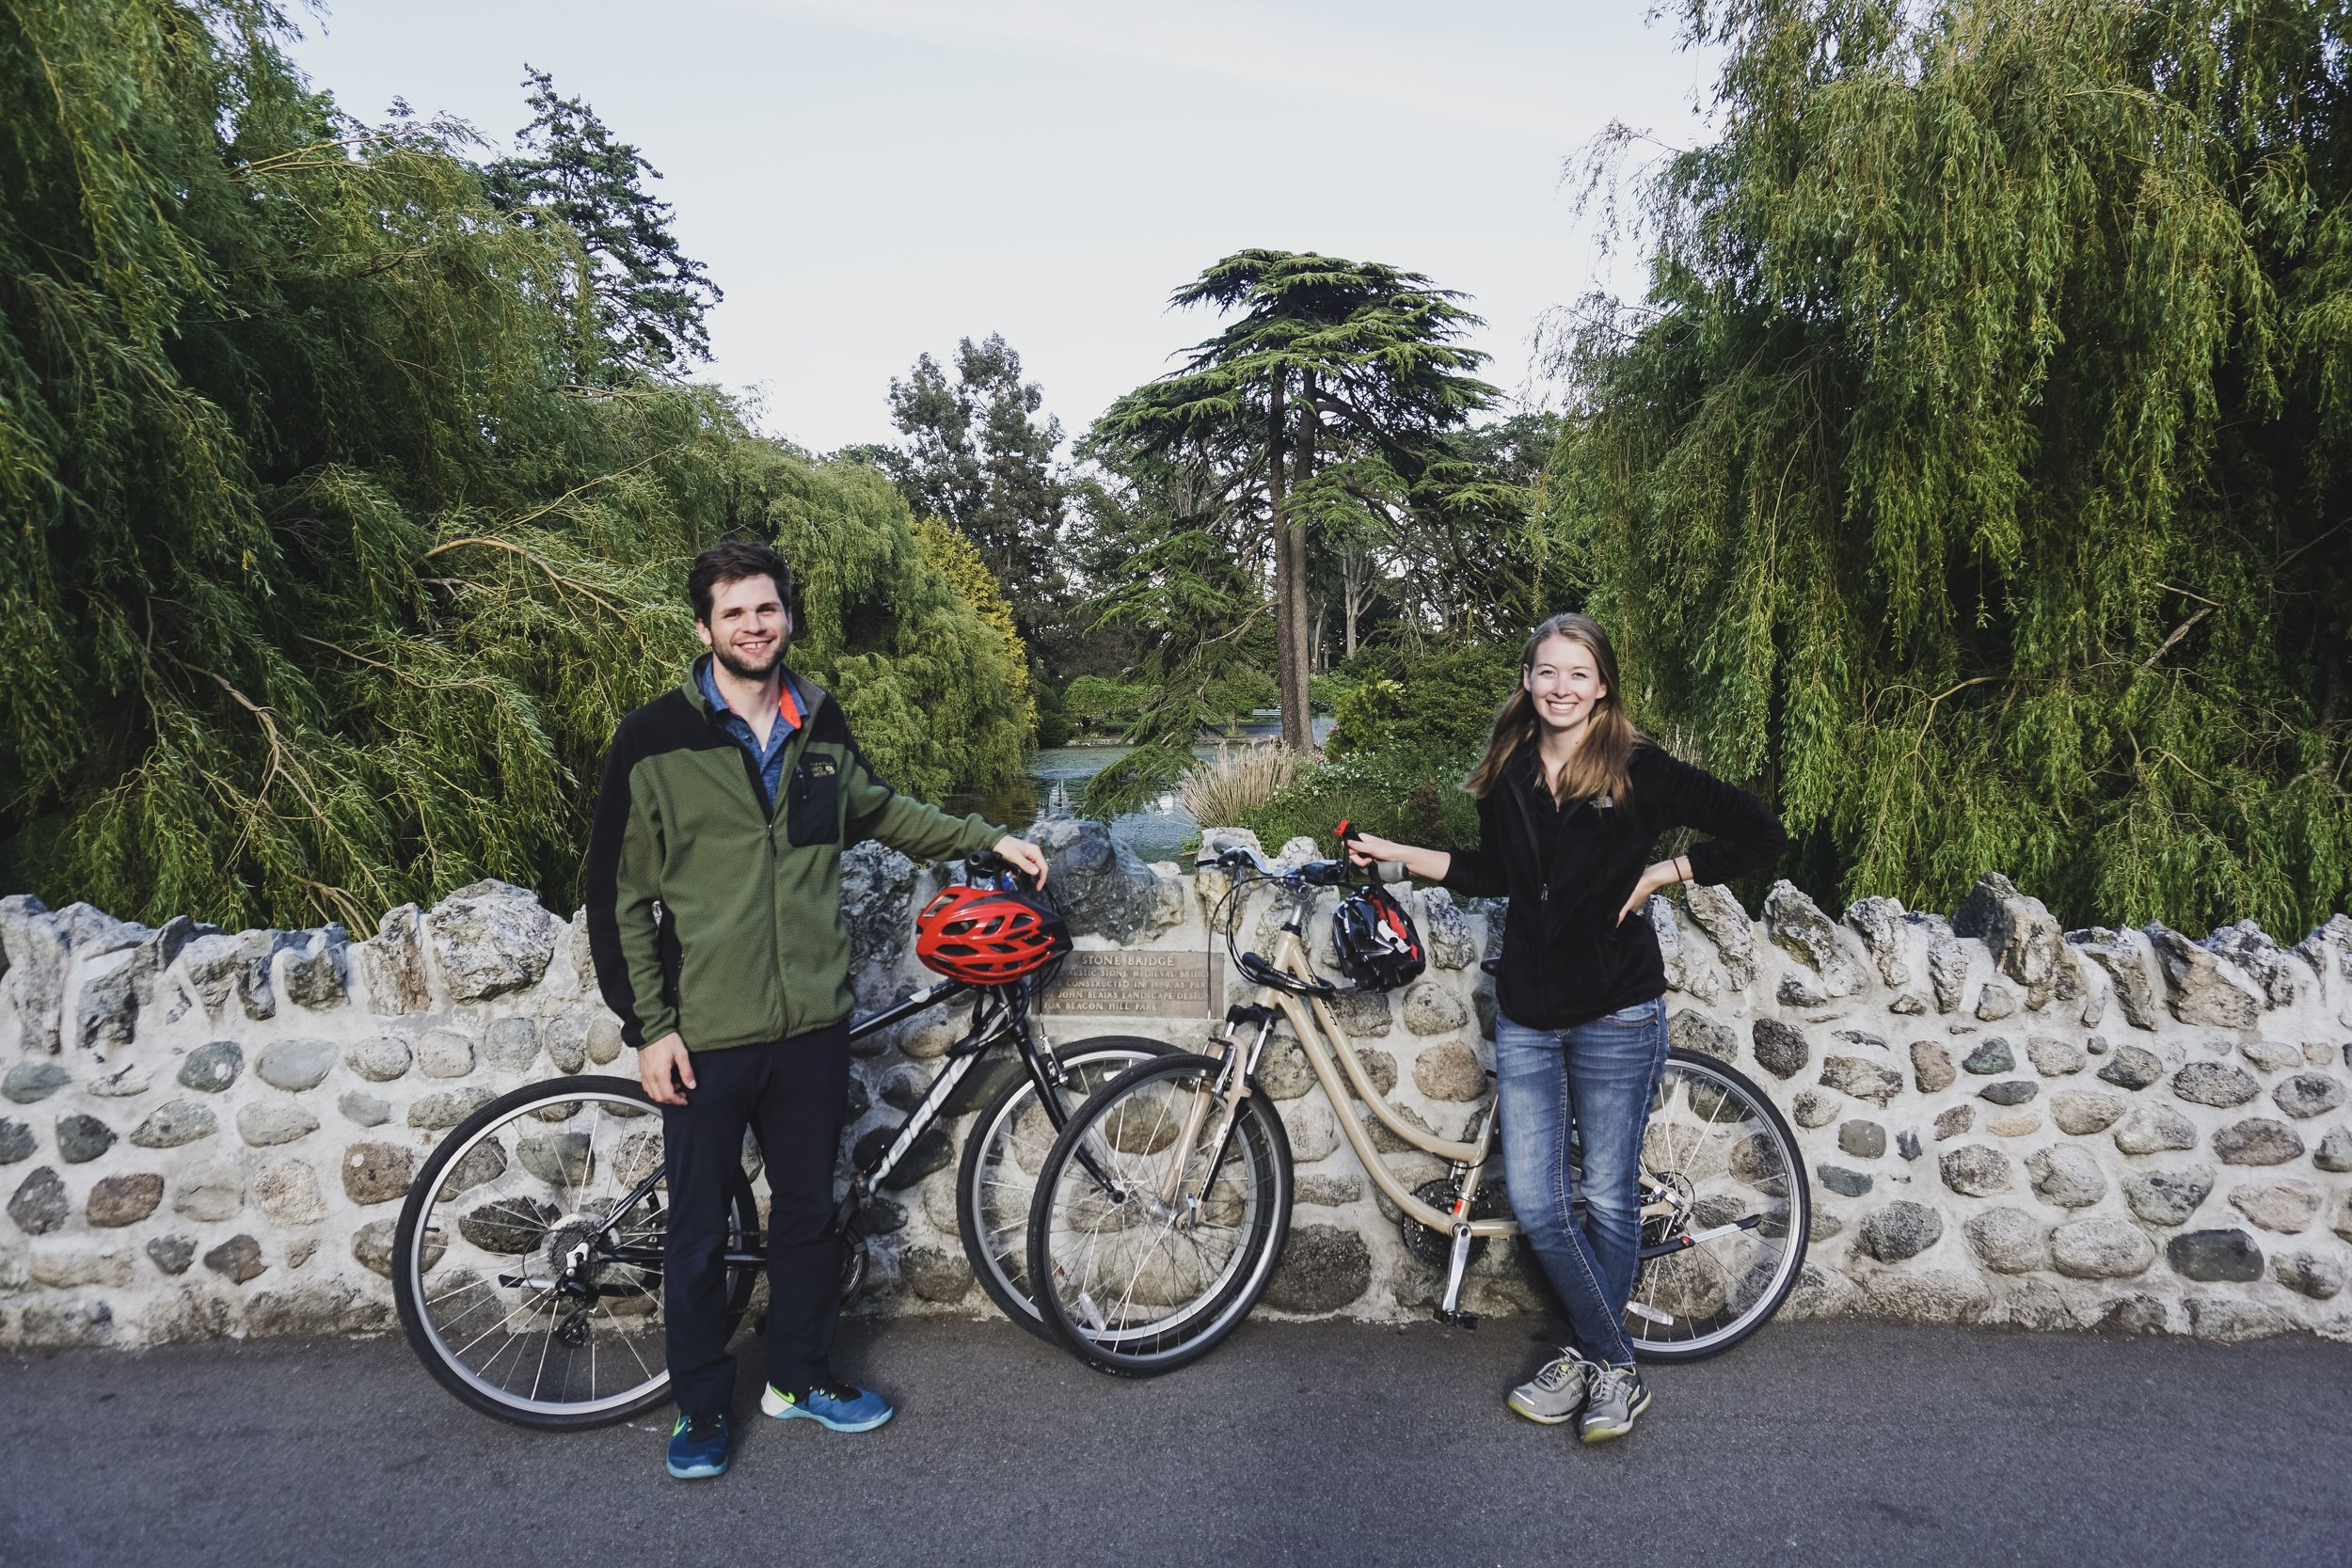 eco-friendly travel_biking.jpg